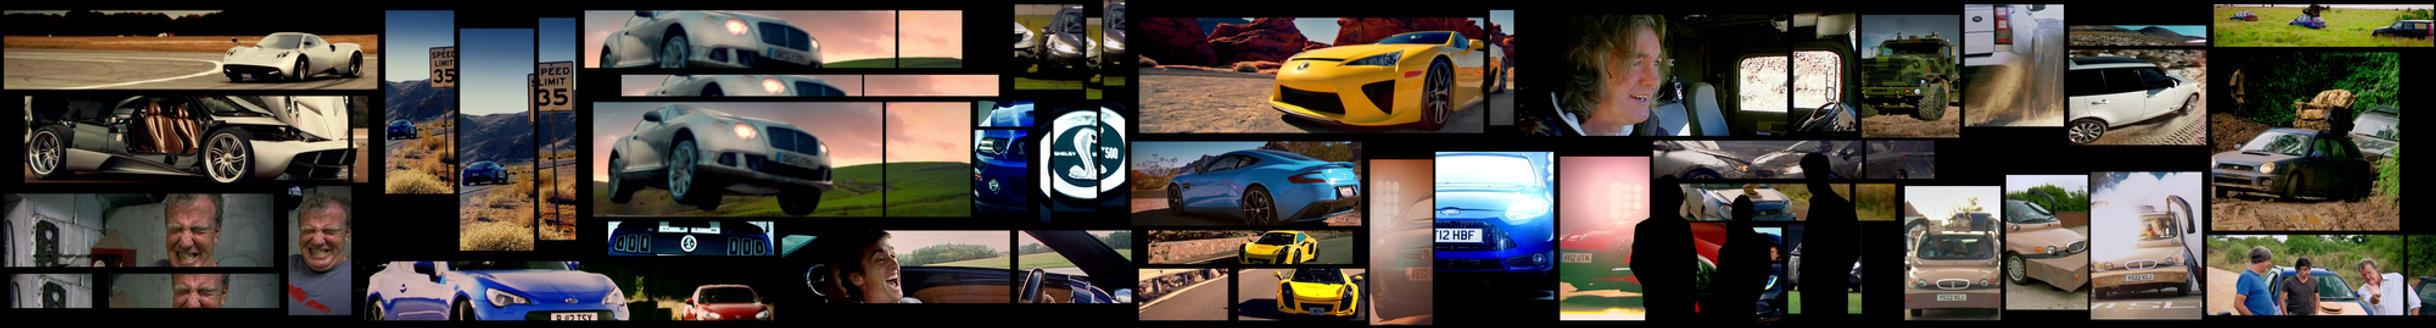 Top Gear S19 by Royalraptor